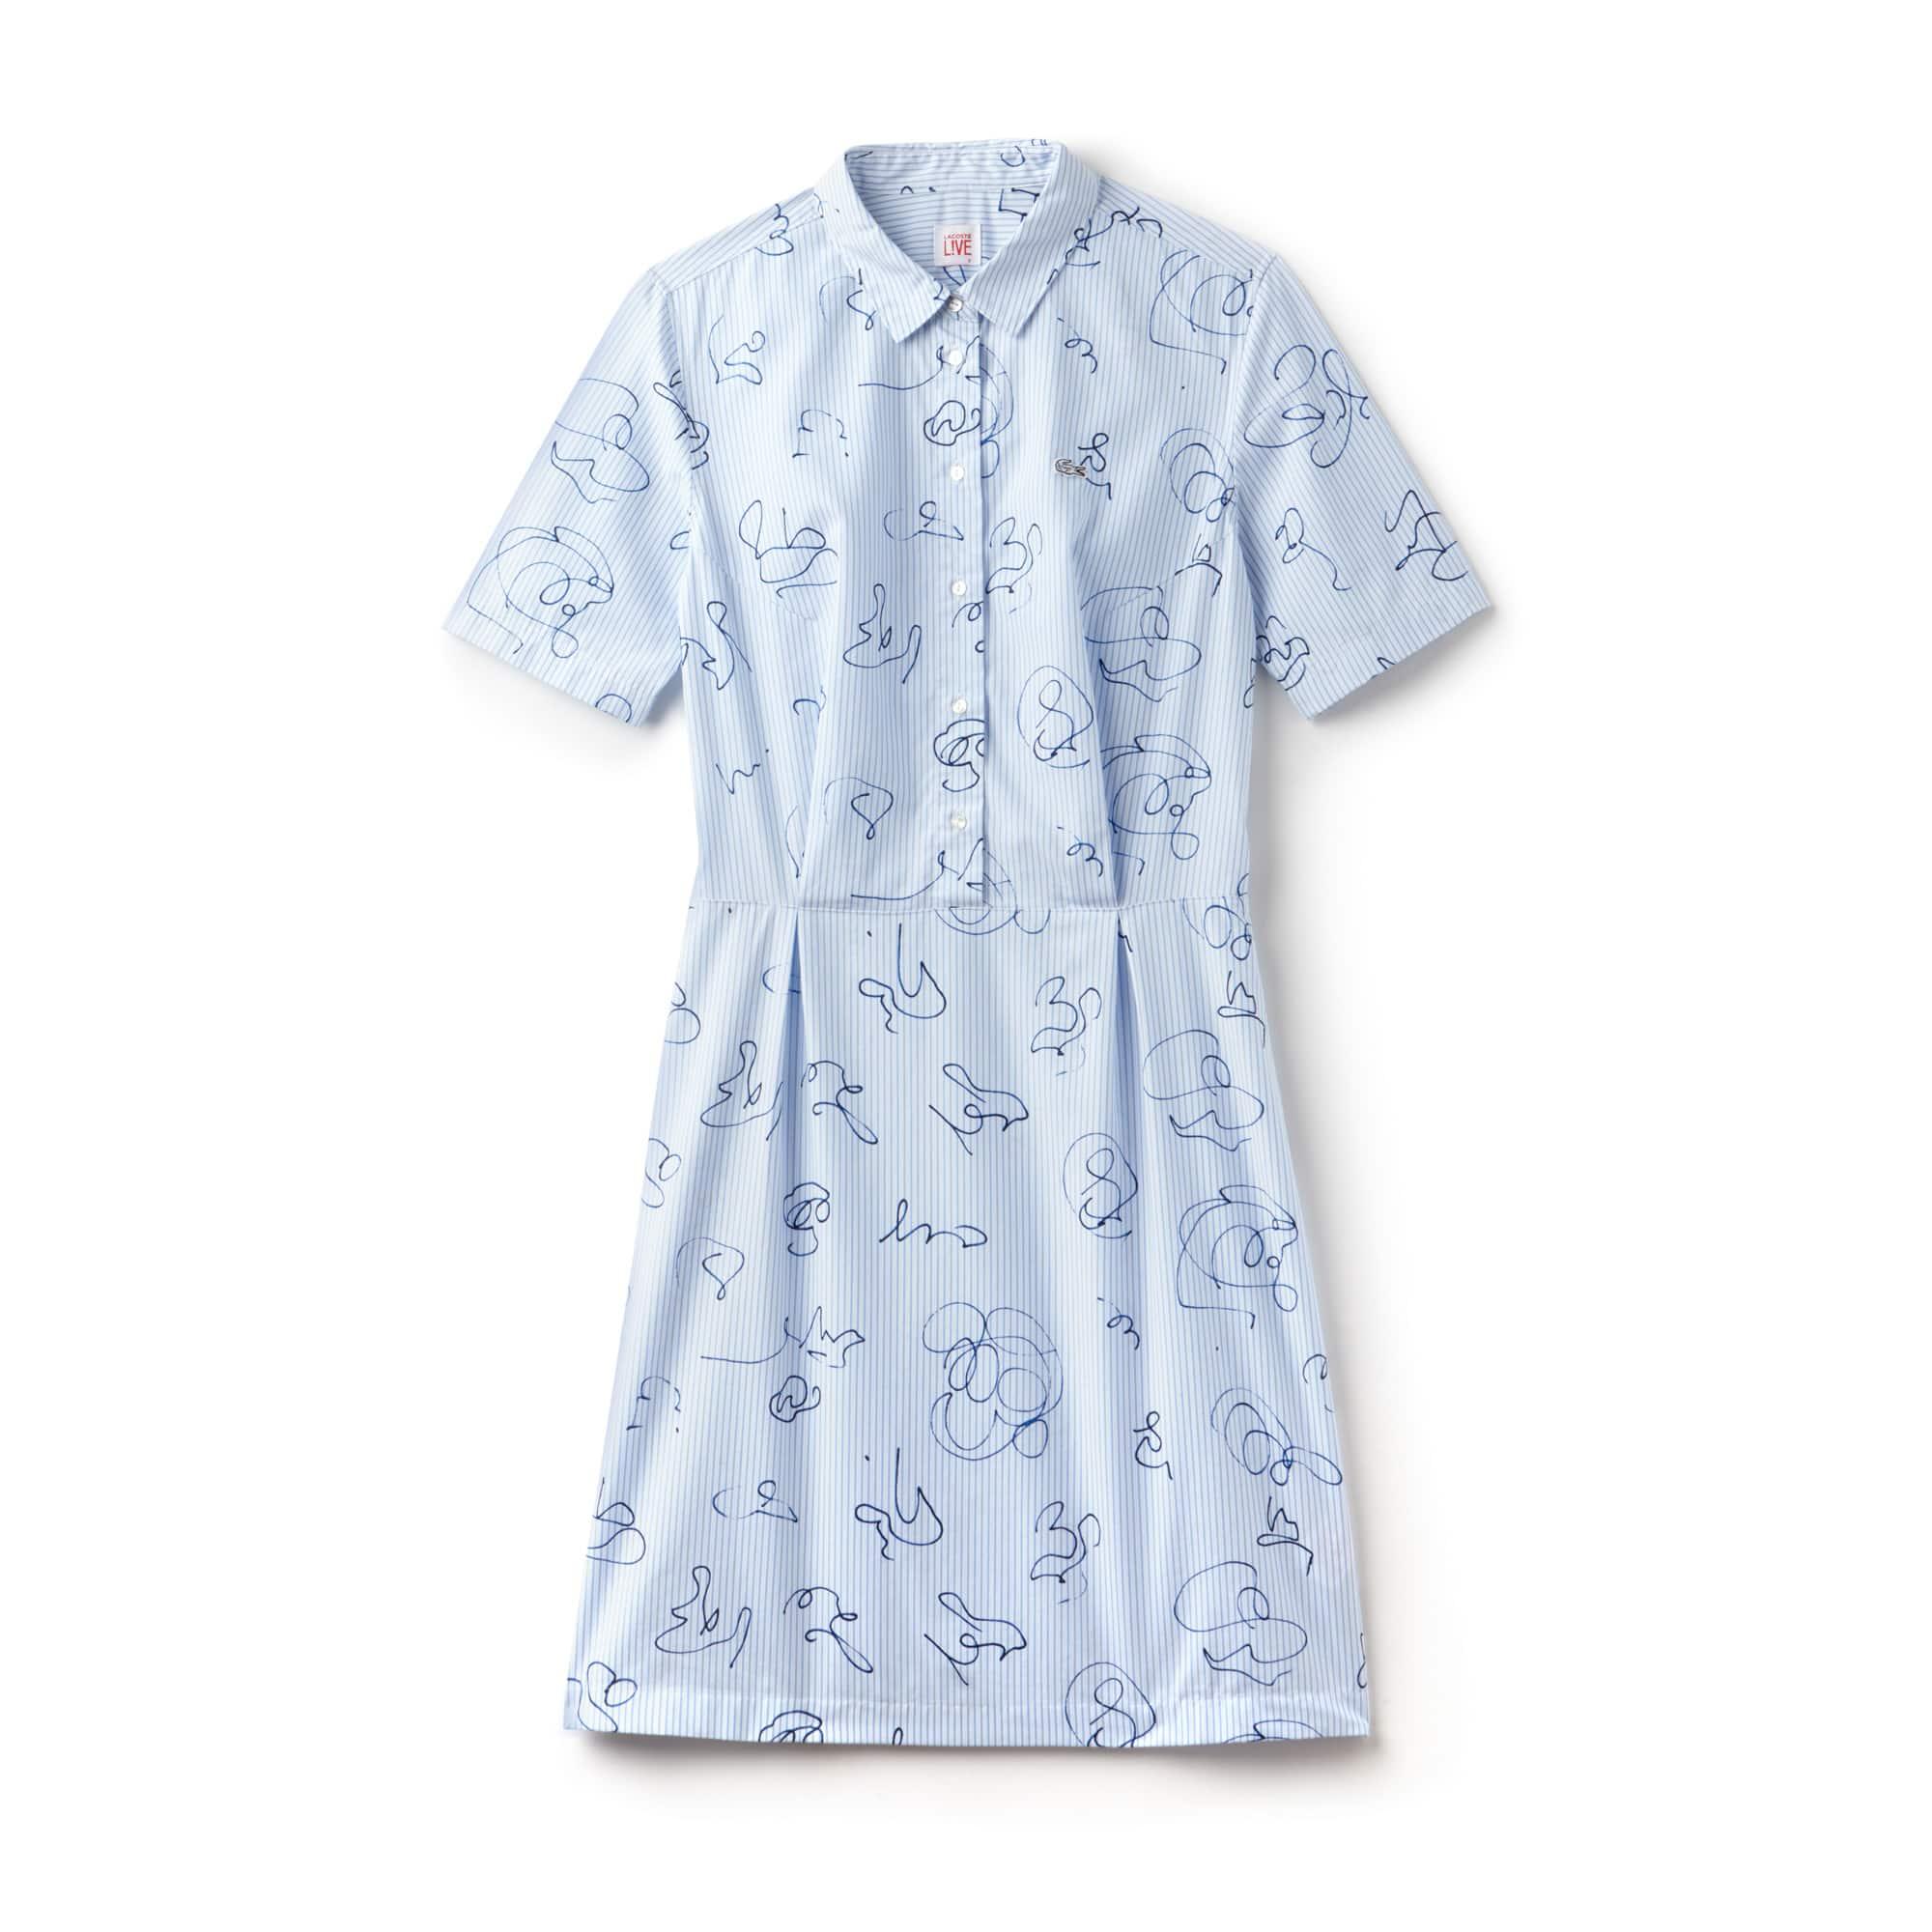 Print Poplin Lacoste Striped Dress Shirt Women's Cotton Live UxtqpwZ